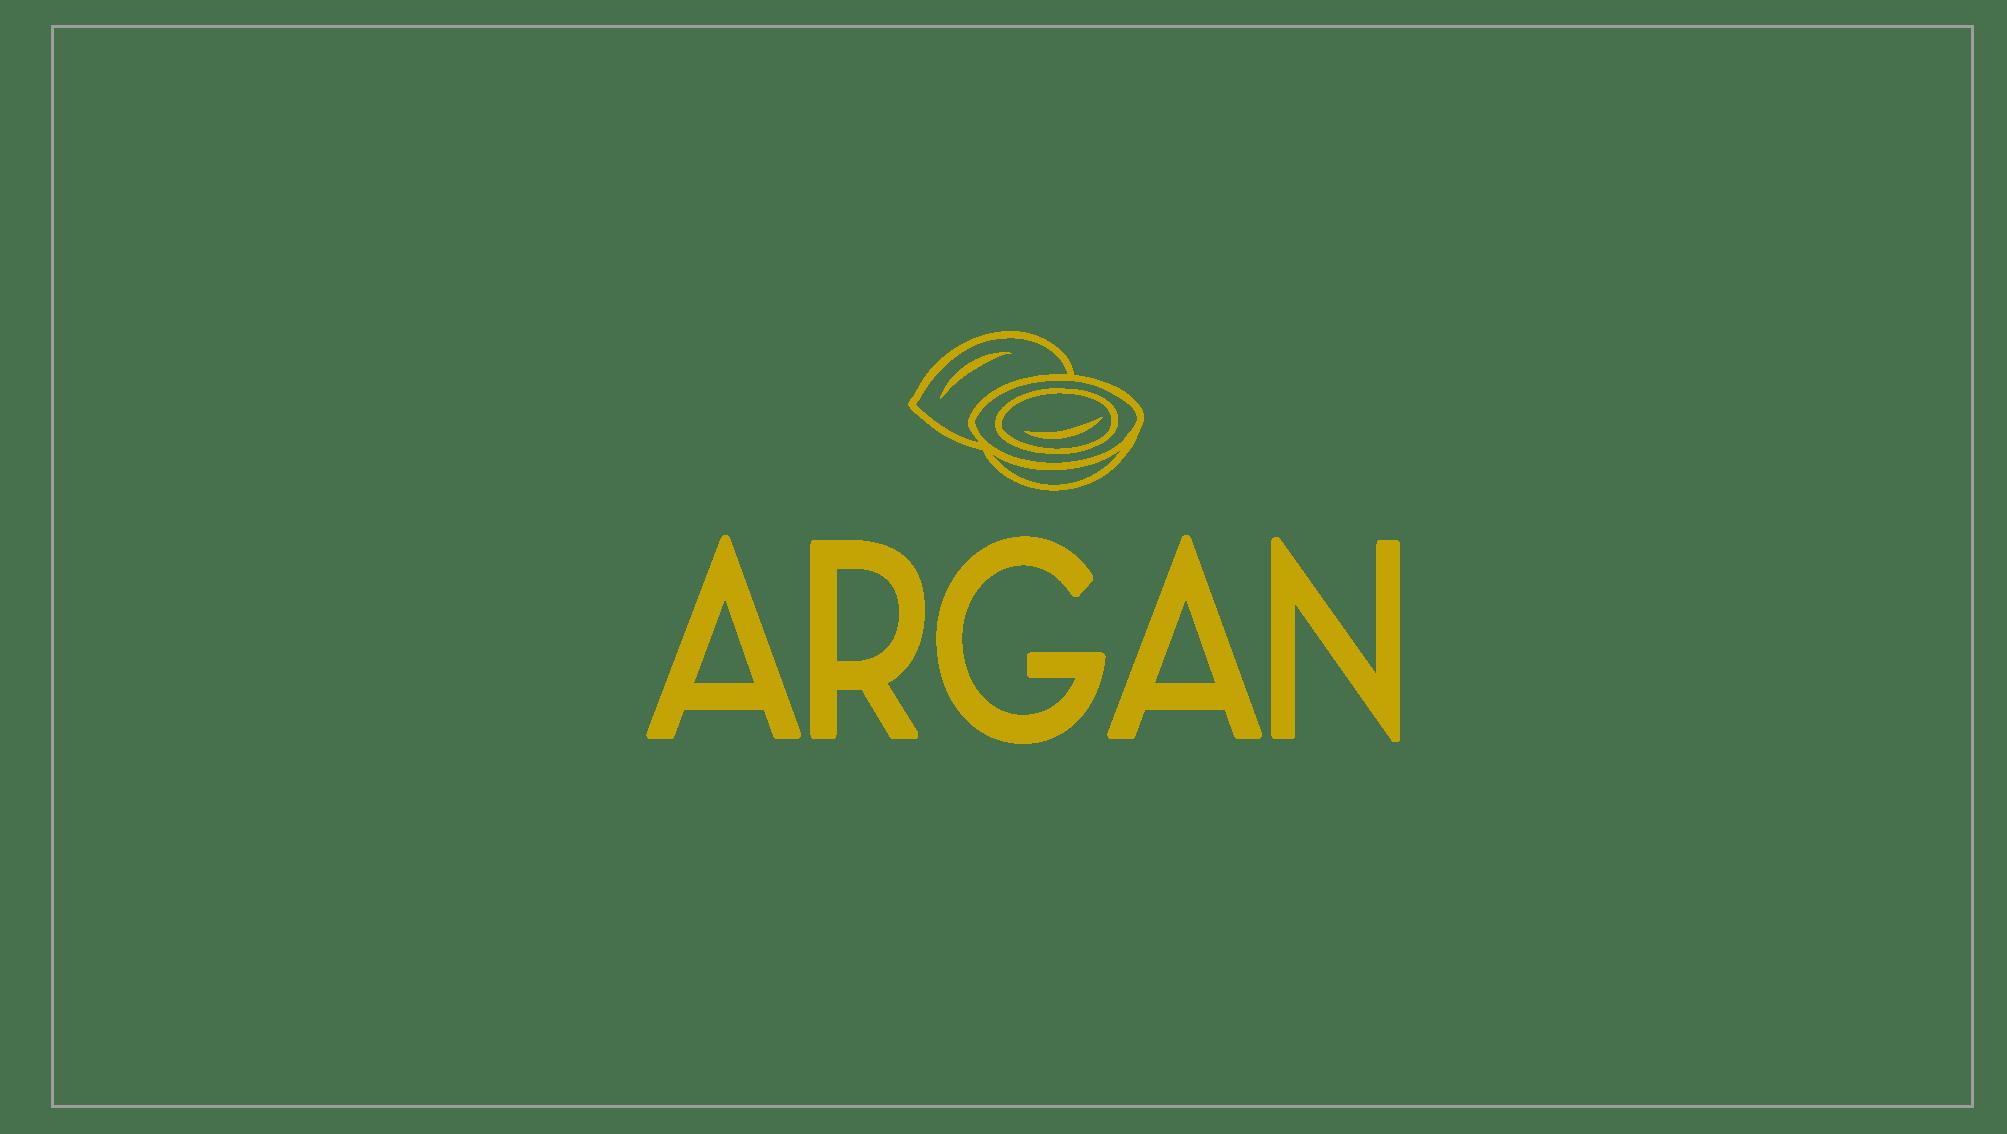 LOGO ARGAN